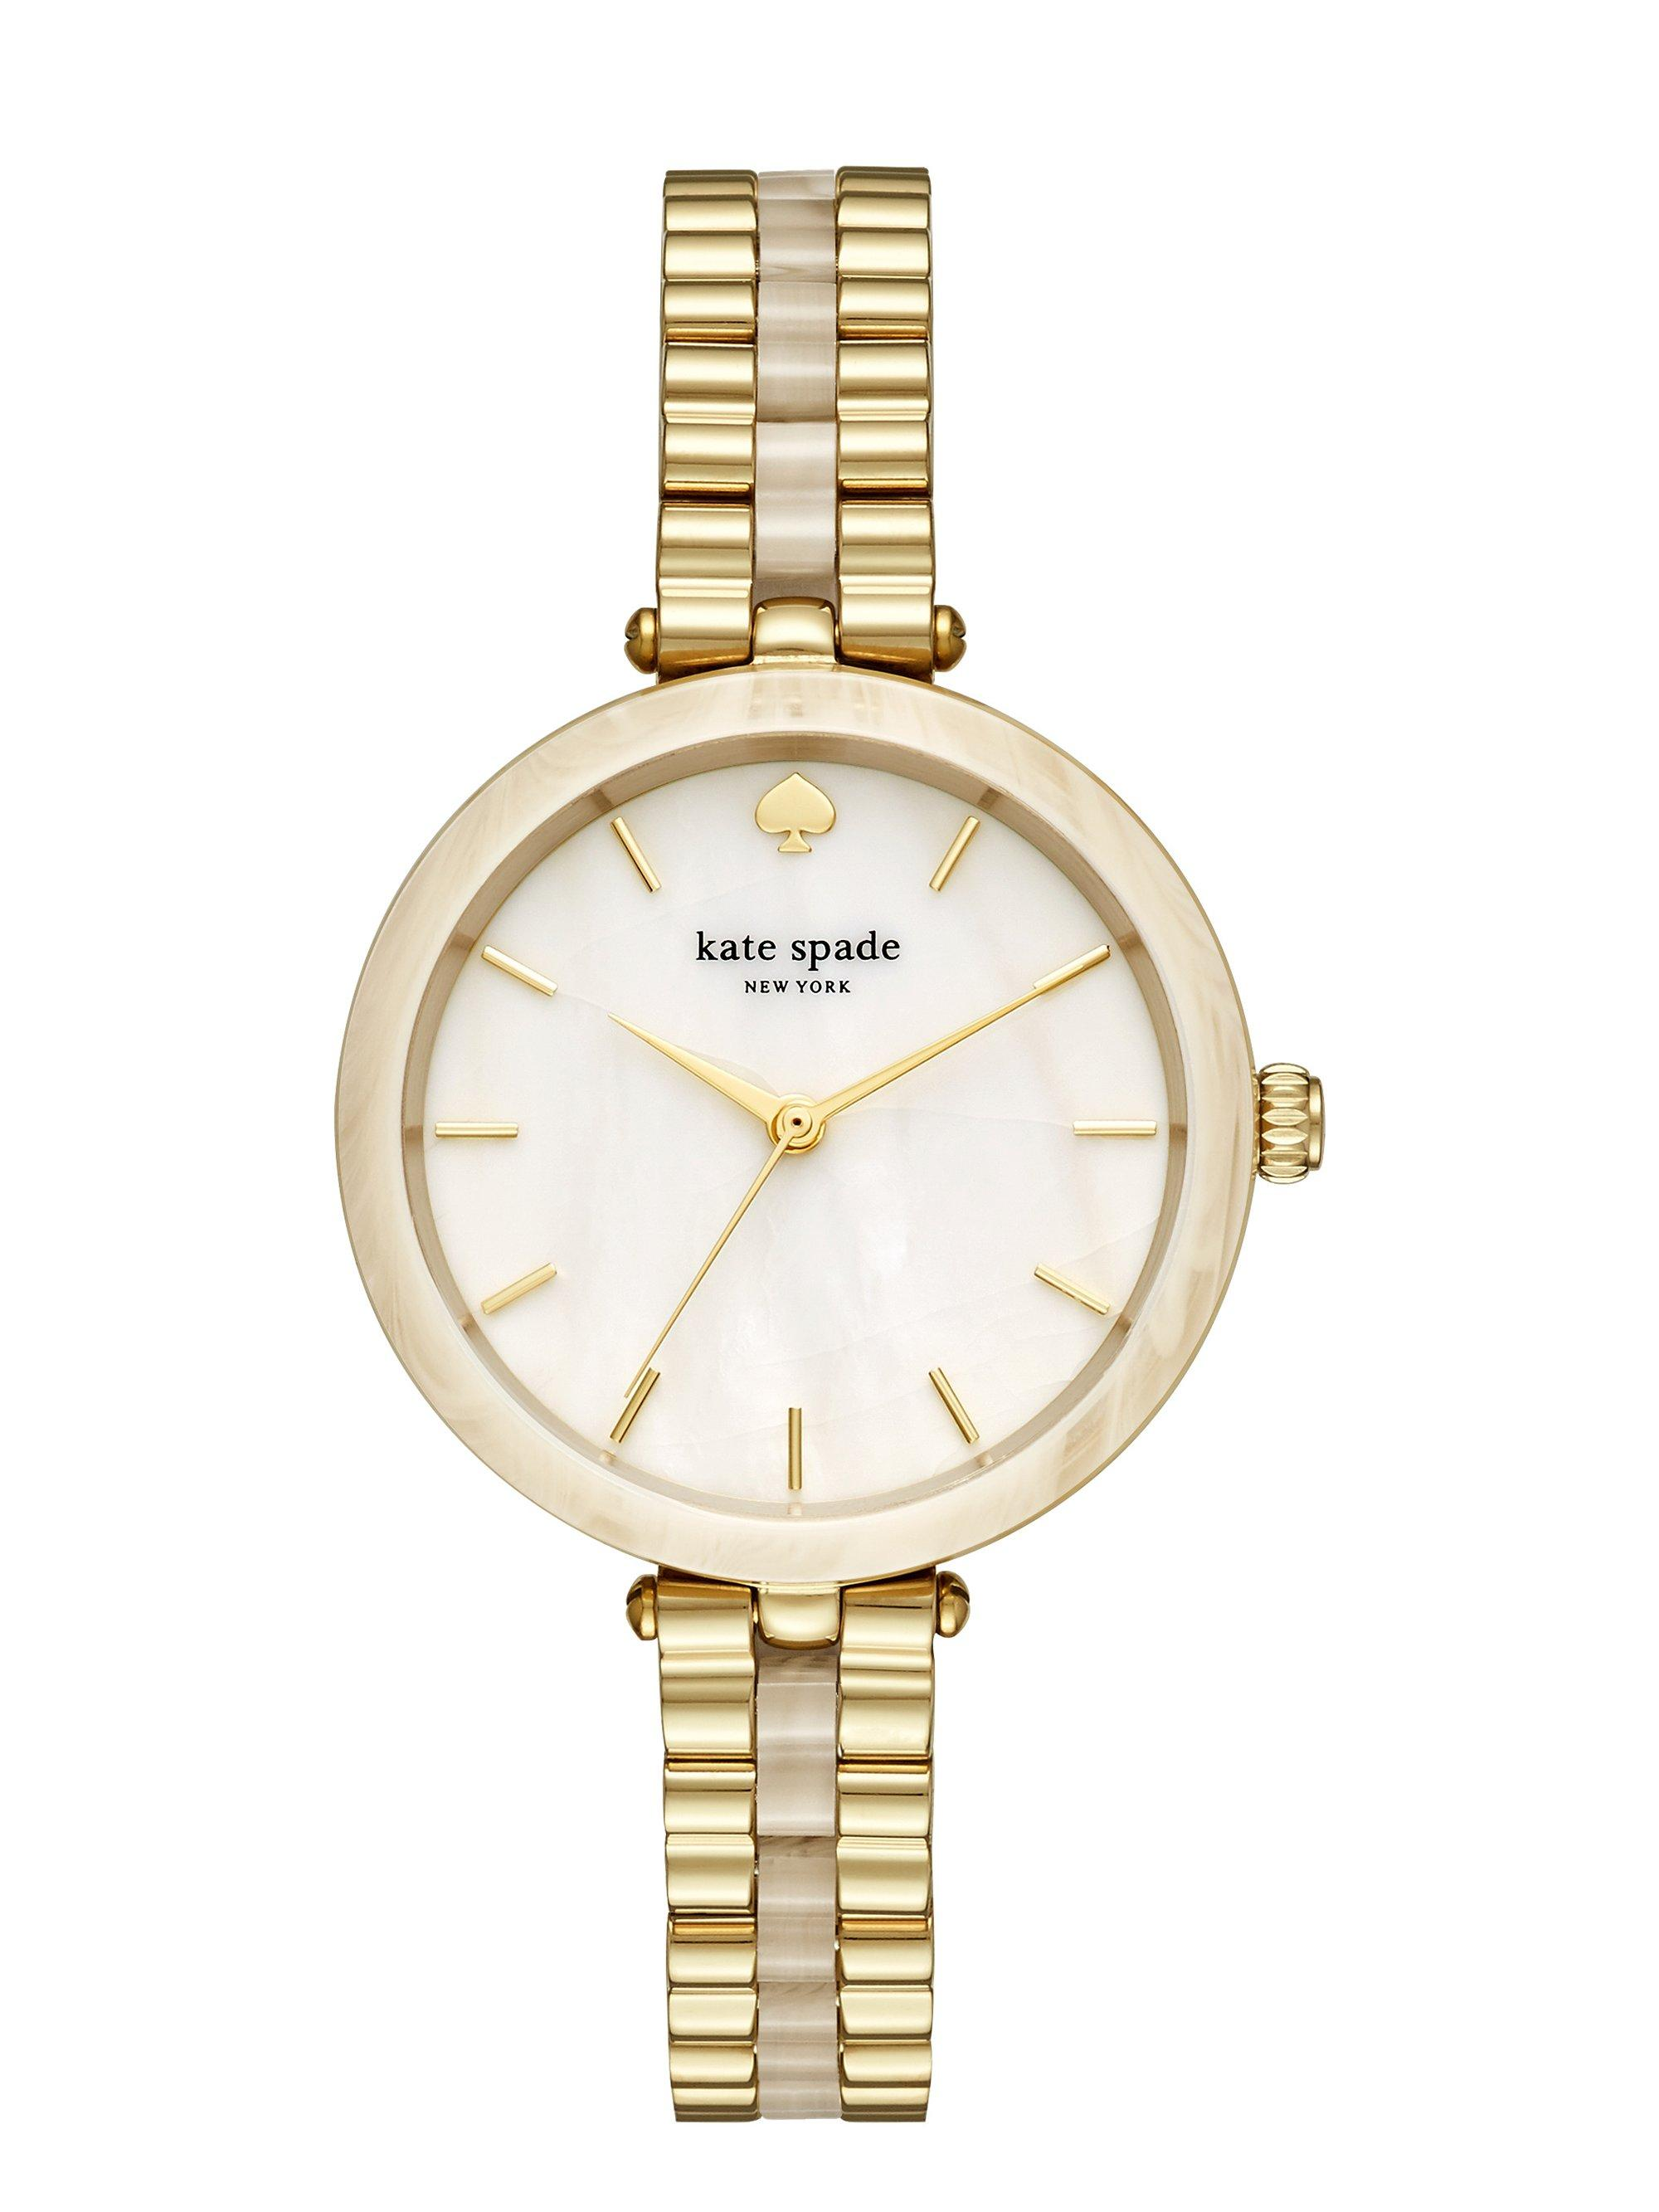 aeb26c73580 Kate Spade - Metallic Women s Holland Gold-tone Stainless Steel   Horn  Acetate Bracelet Watch. View fullscreen